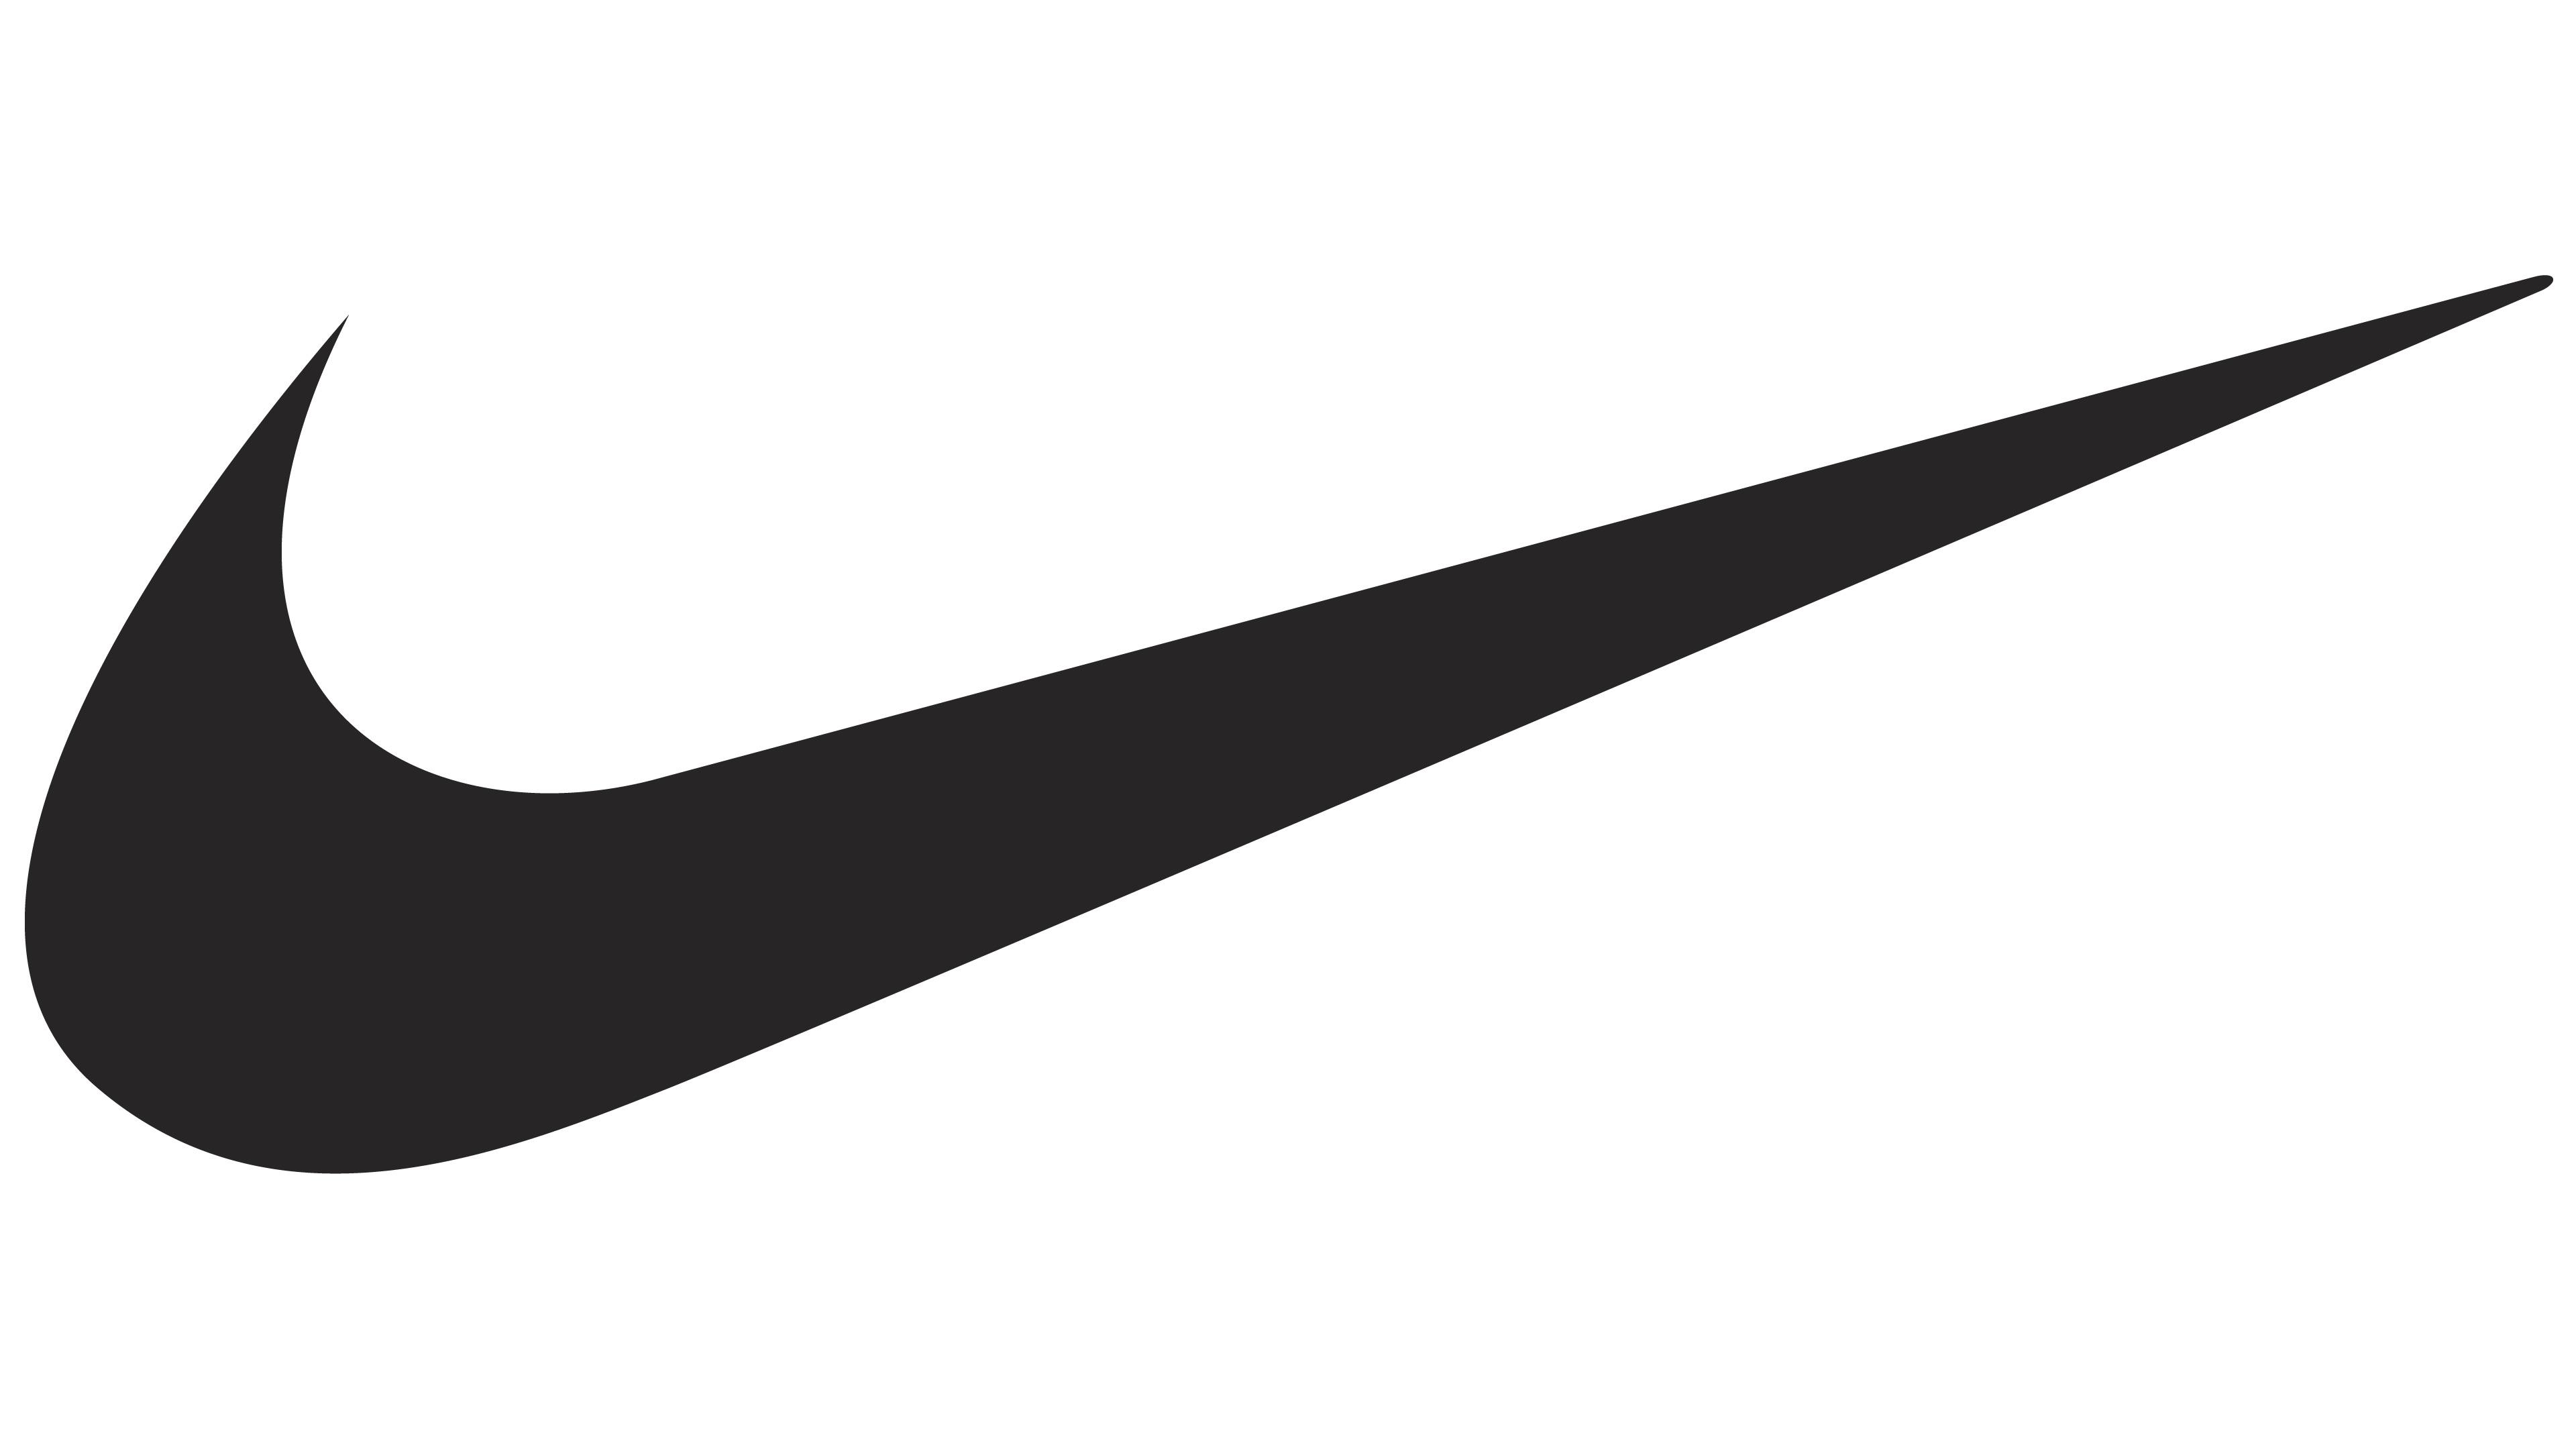 Nike, la storia del logo Nike | Blog de Running, Fitness, Sneakers y Estilo  de Vida | Runnics